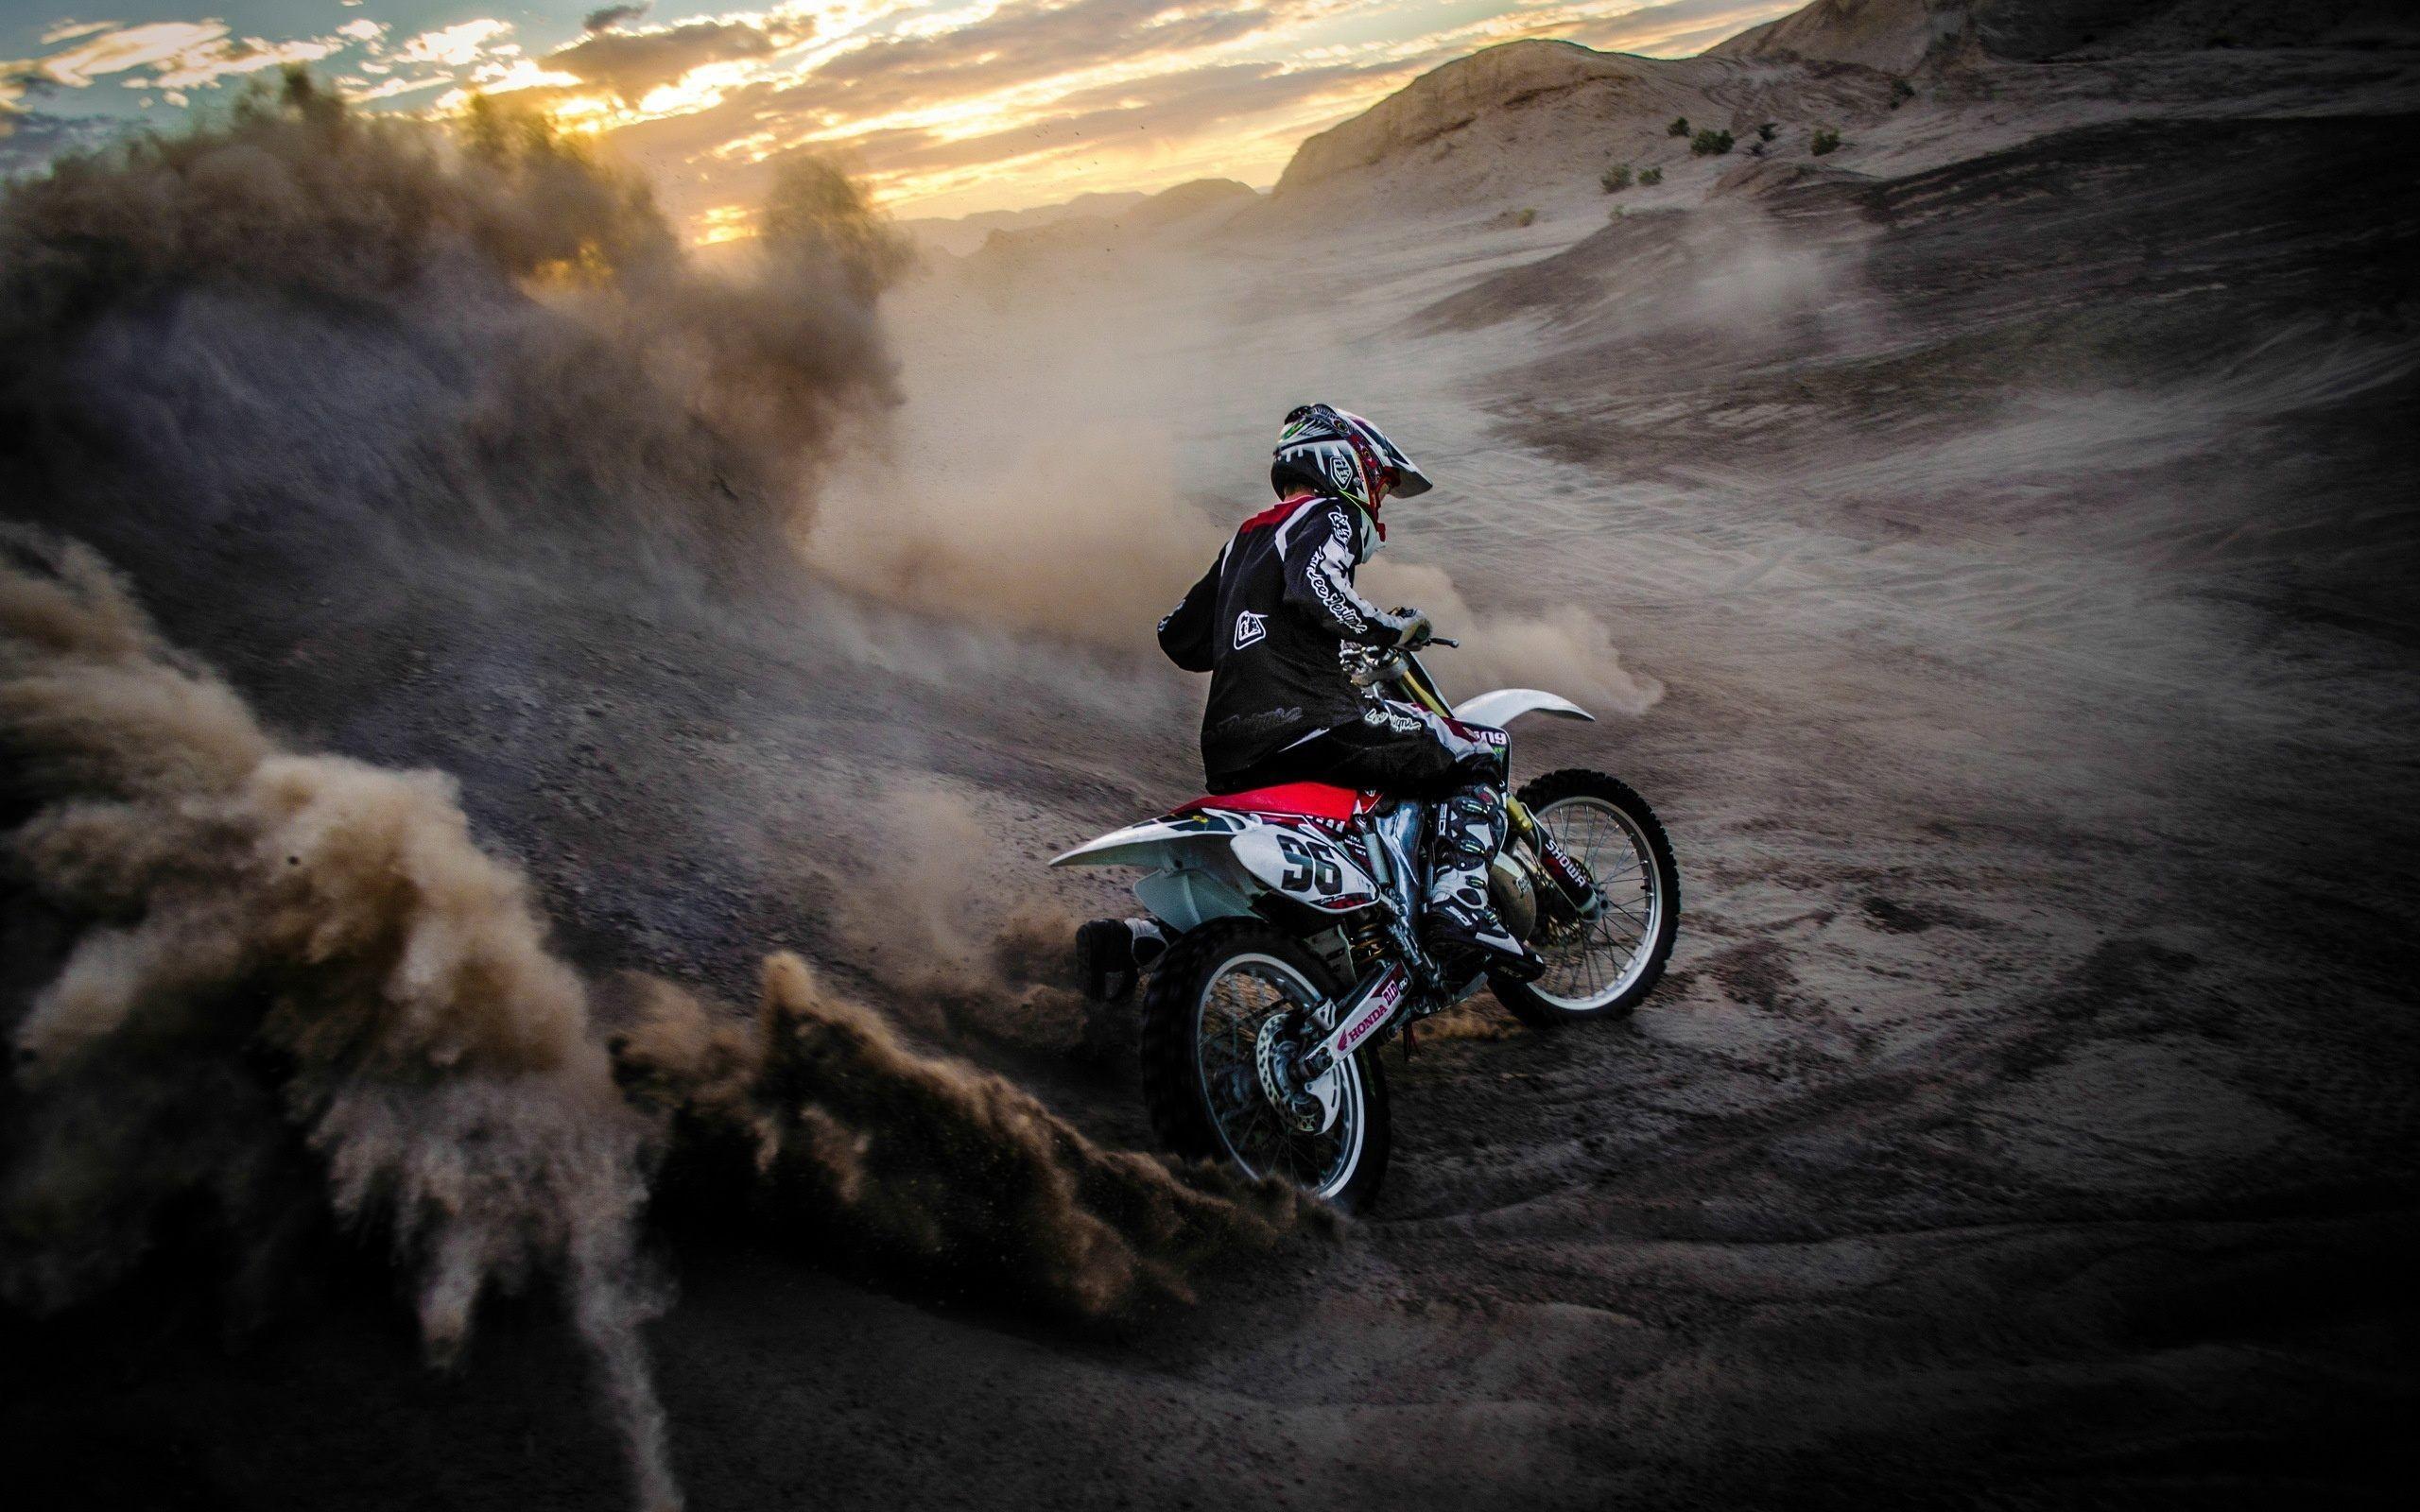 Crazy Race Motorcycle Wallpaper HD Of Motorbike Racing